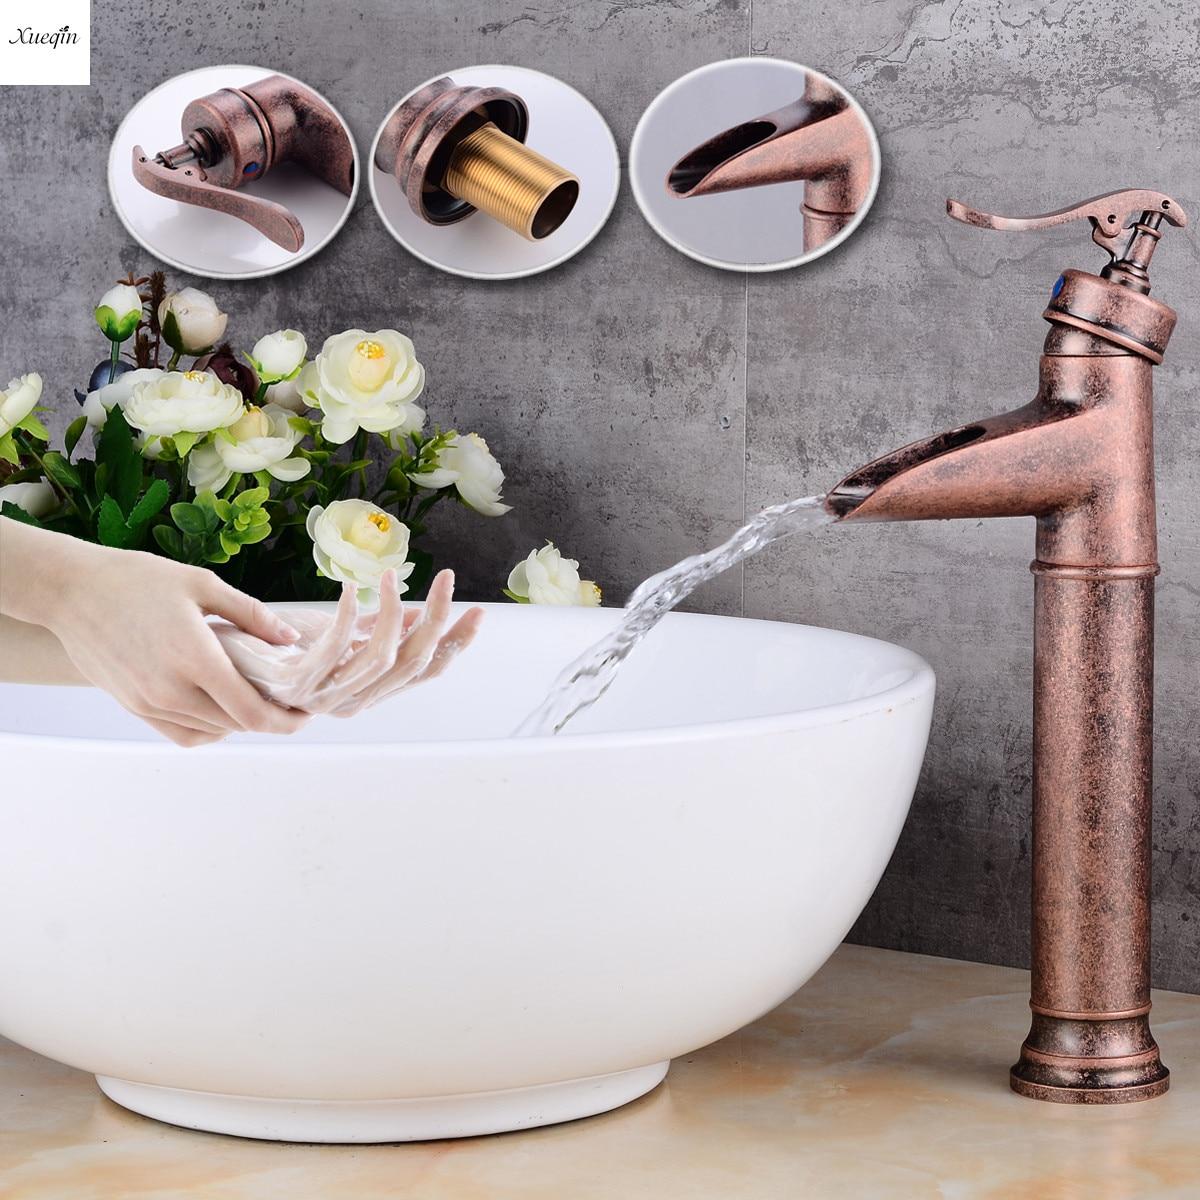 купить European Basin Hot And Cold Faucet Copper Elevated Platform Bathroom Basin Faucet Single Handle Wide Mouth Waterfall Mixer Taps по цене 2855.4 рублей